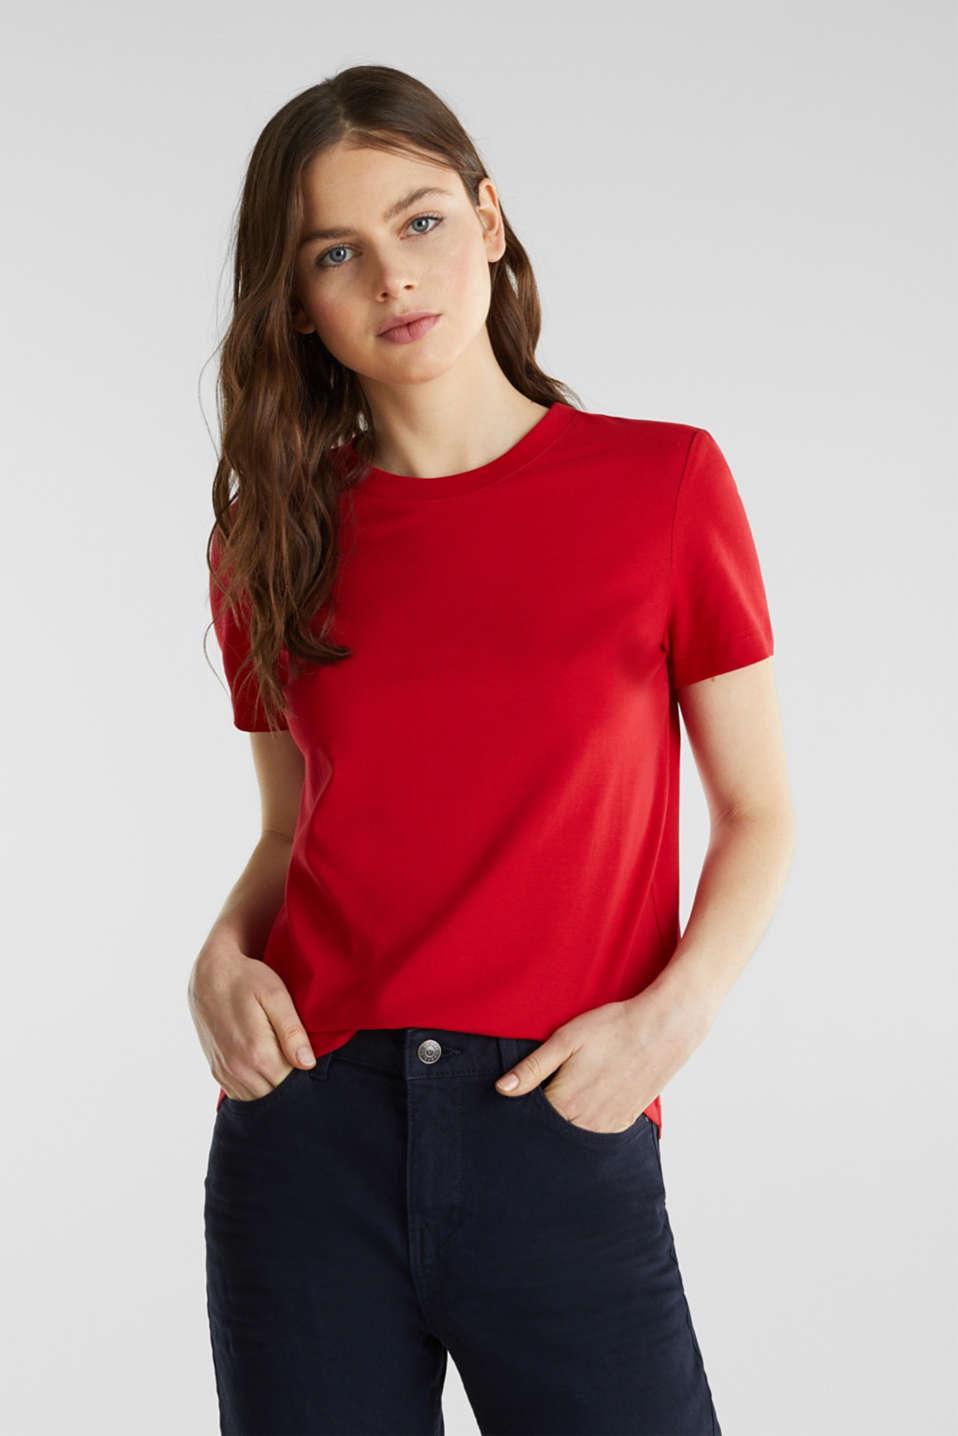 Organic cotton T-shirt, 100% cotton